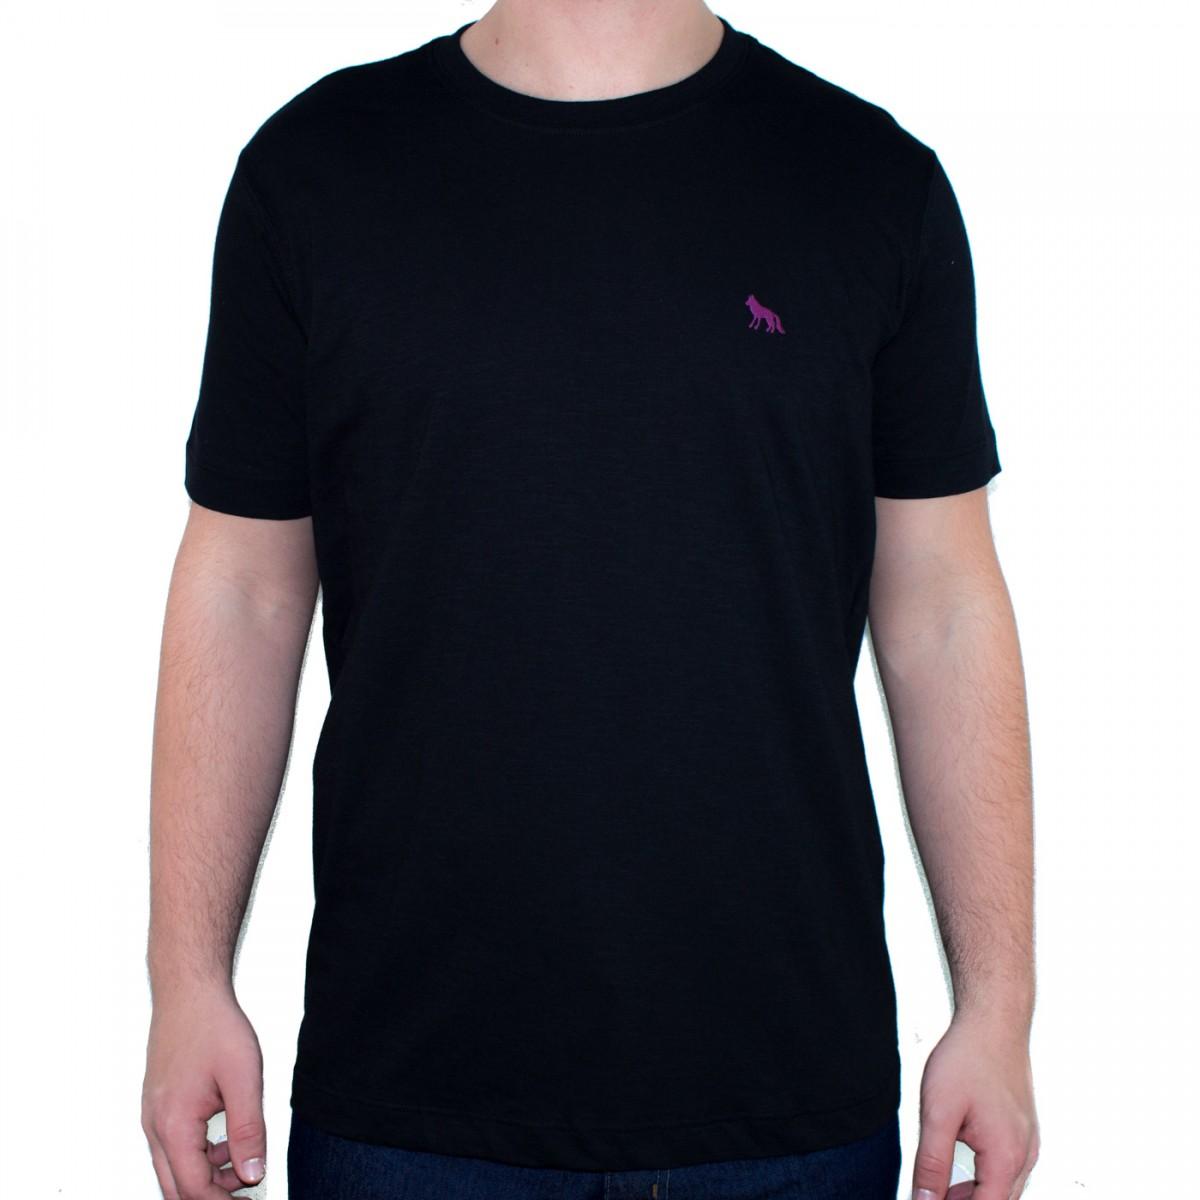 e2d103b87 Bizz Store - Camiseta Masculina Acostamento Manga Curta Rosa